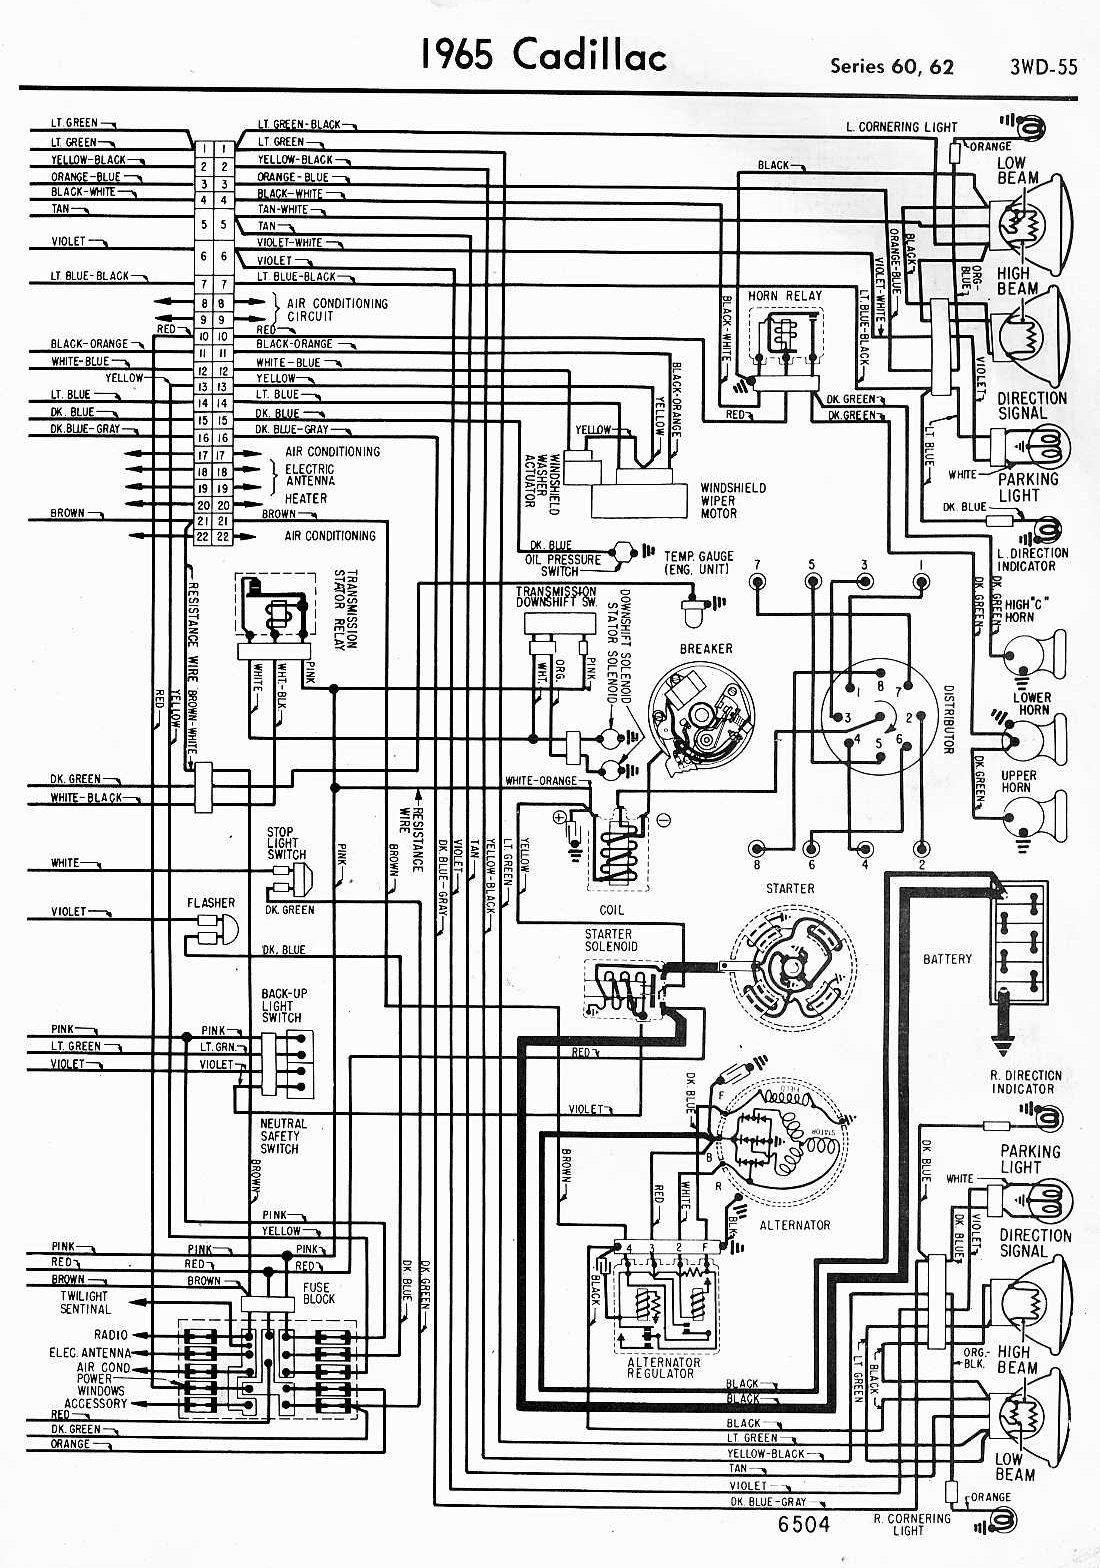 1984 cadillac eldorado biarritz wiring diagram cadillac